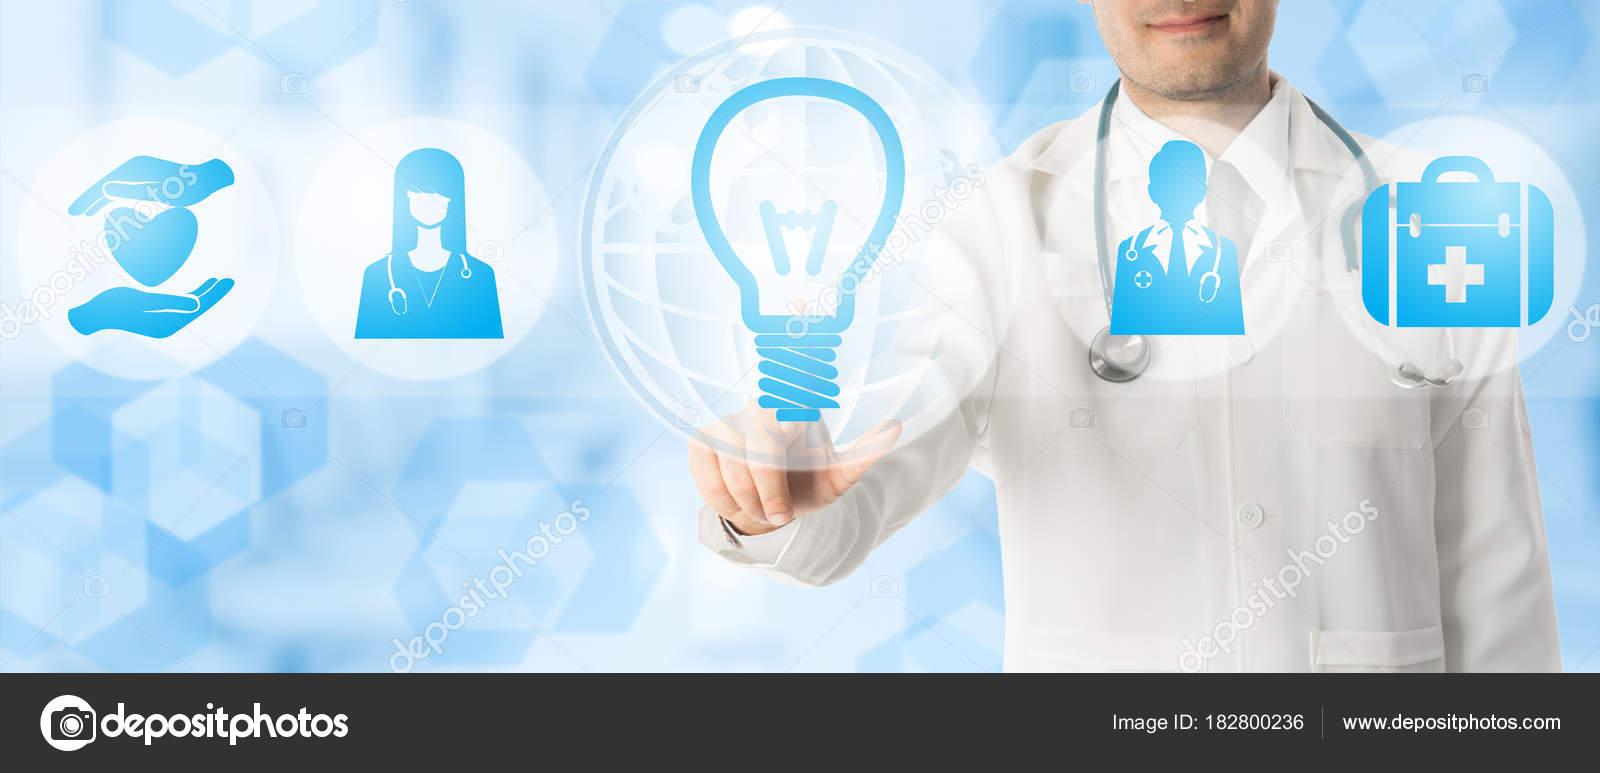 Medizinische Innovation-Konzept - Arzt mit Lampe-Symbol — Stockfoto ...